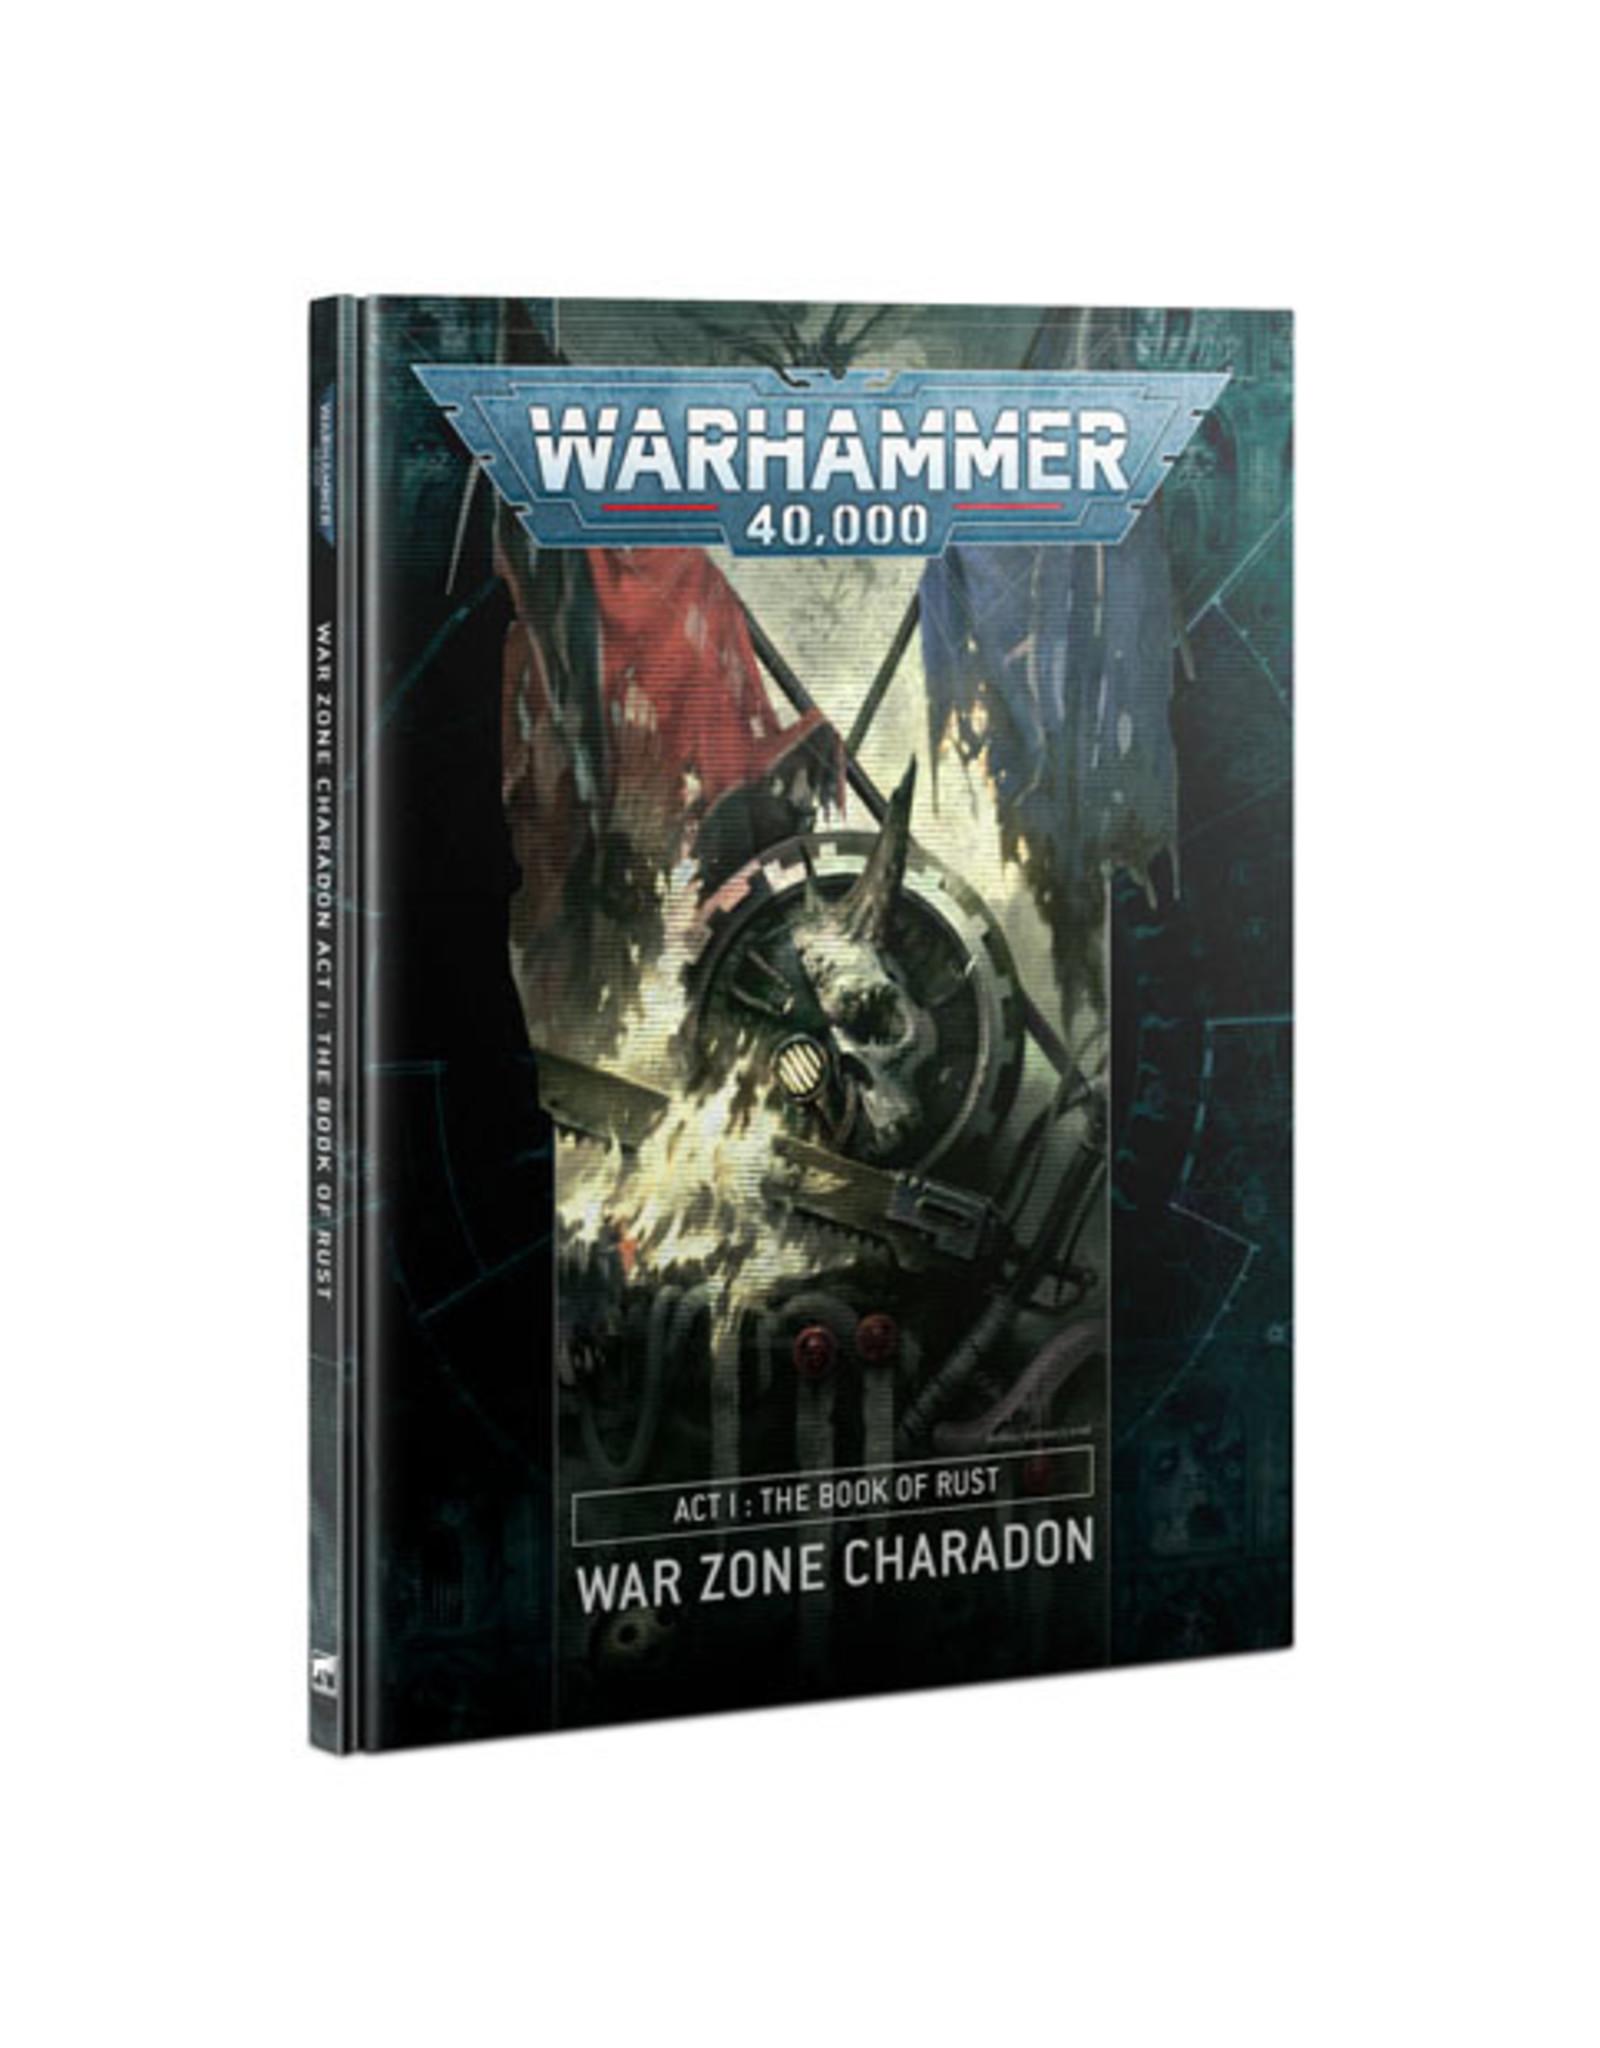 Warhammer 40k Charadon Act 1 Book Of Rust (HB)